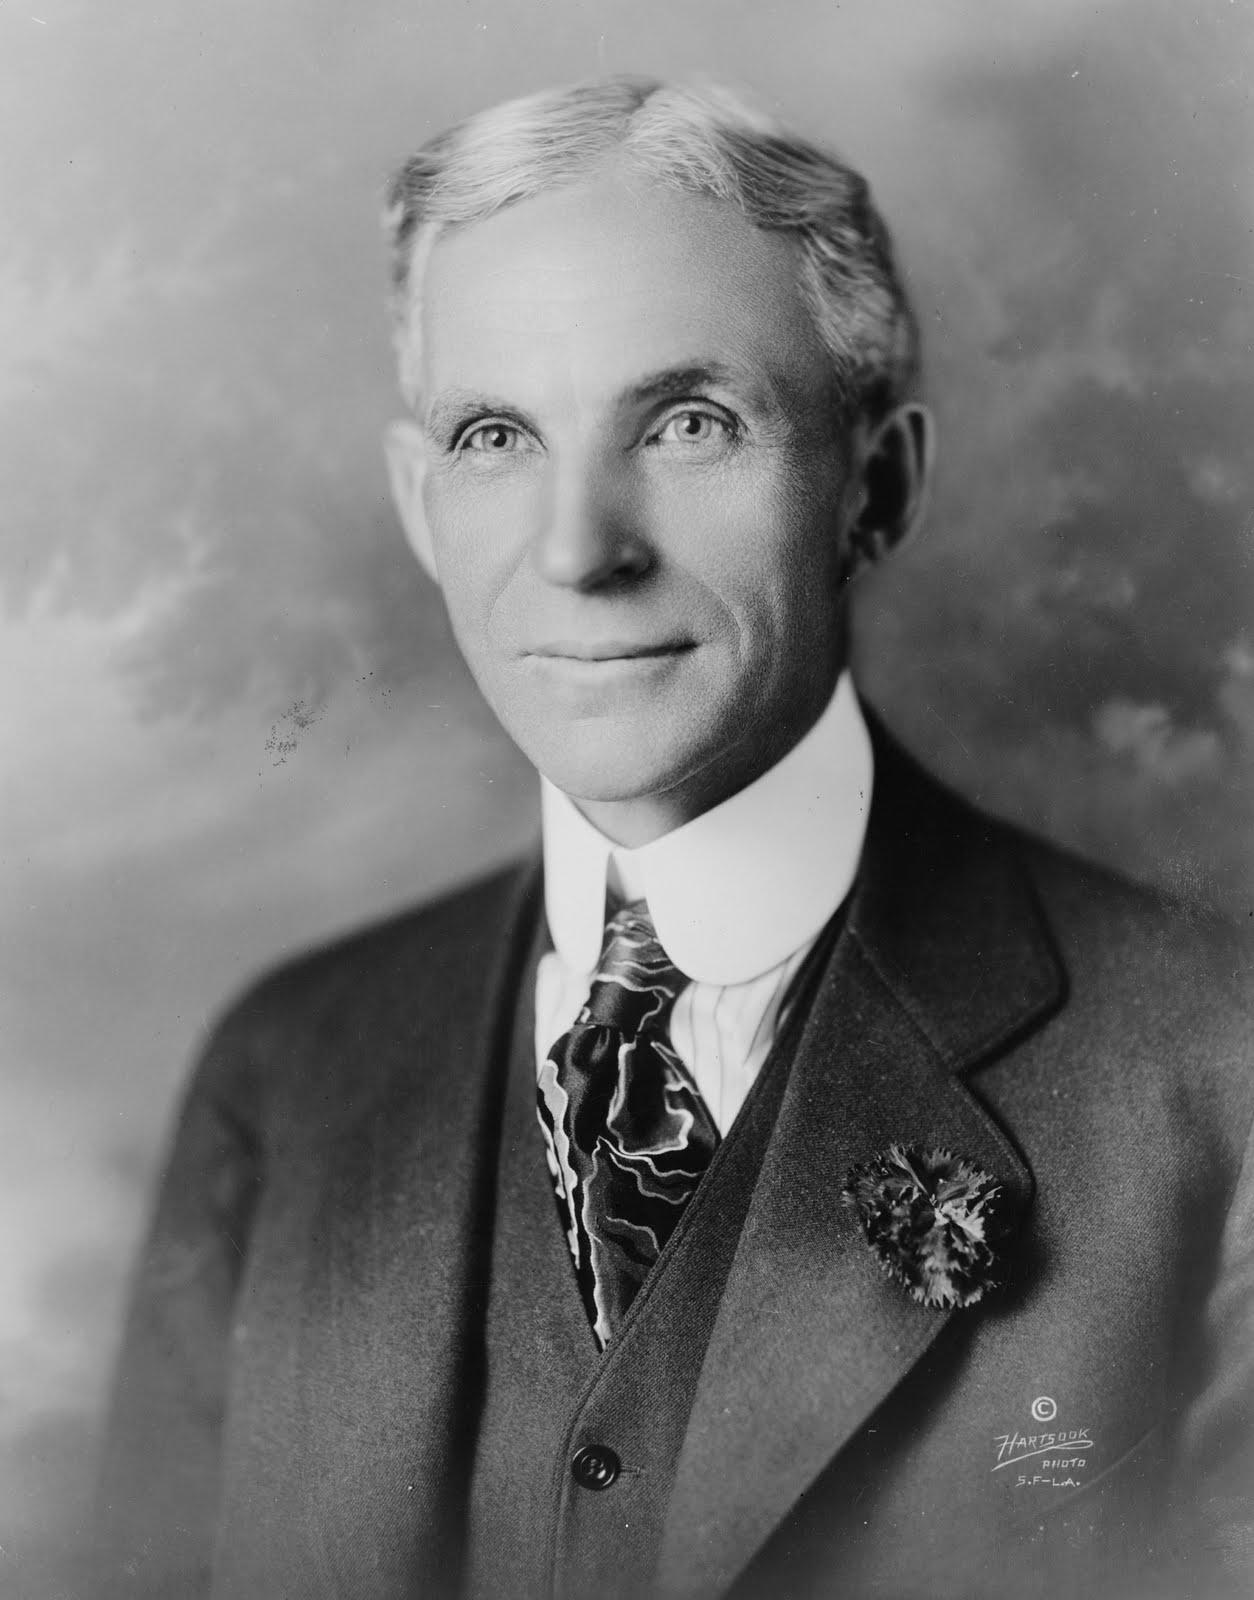 Frases celebres de Henry Ford :: Frasedehoy.com (Página 1) williamhill non-runner